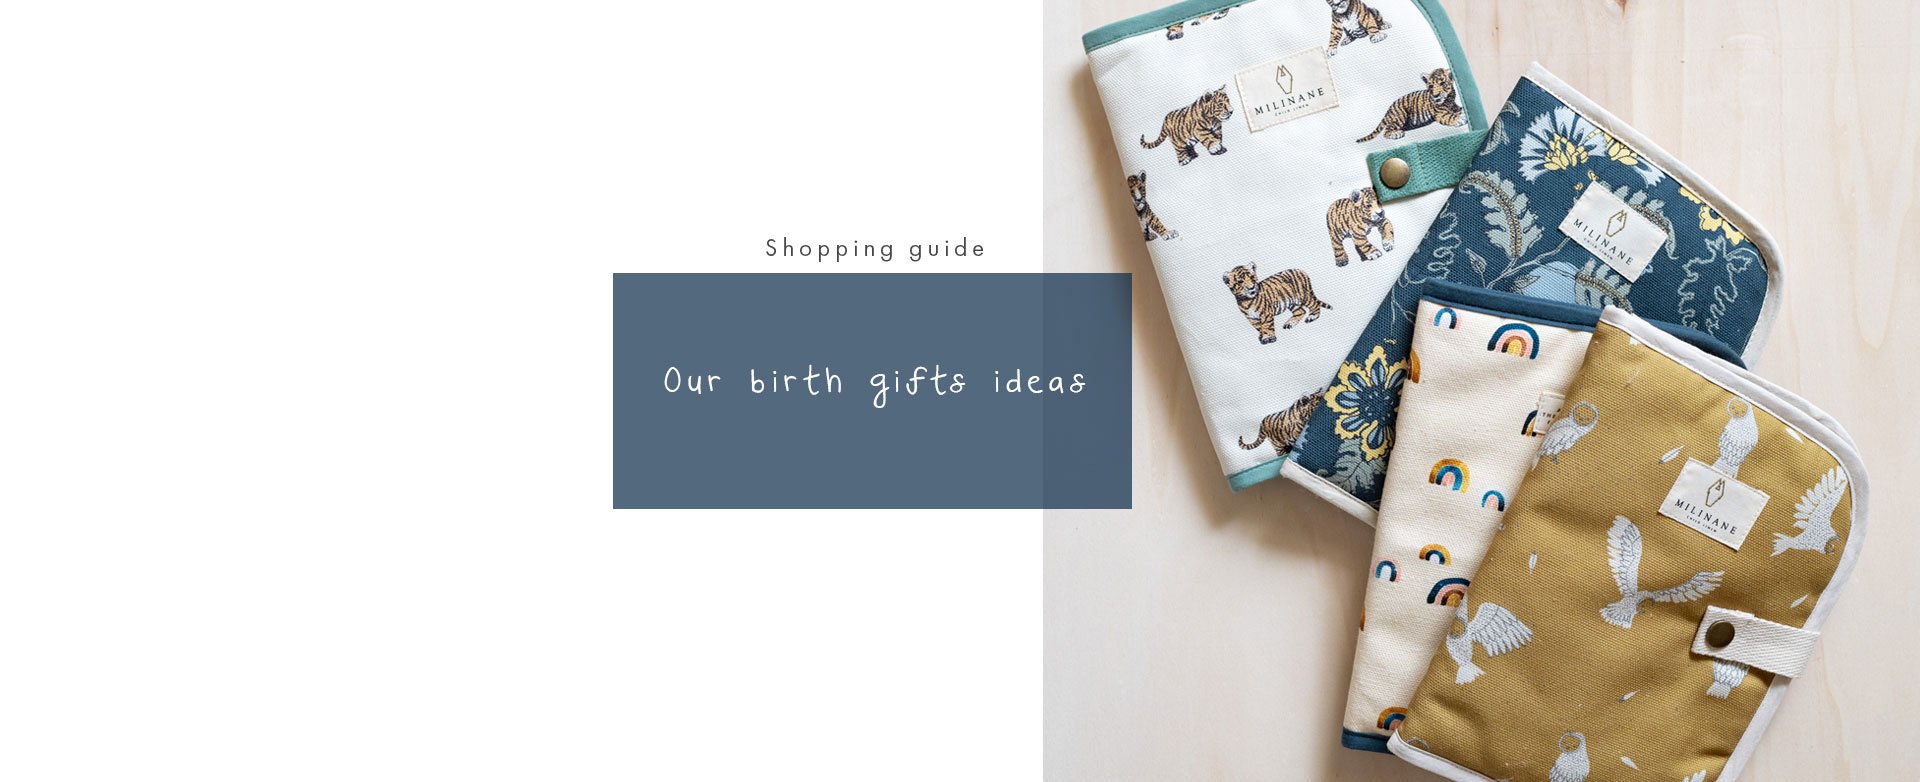 Birth gift ideas